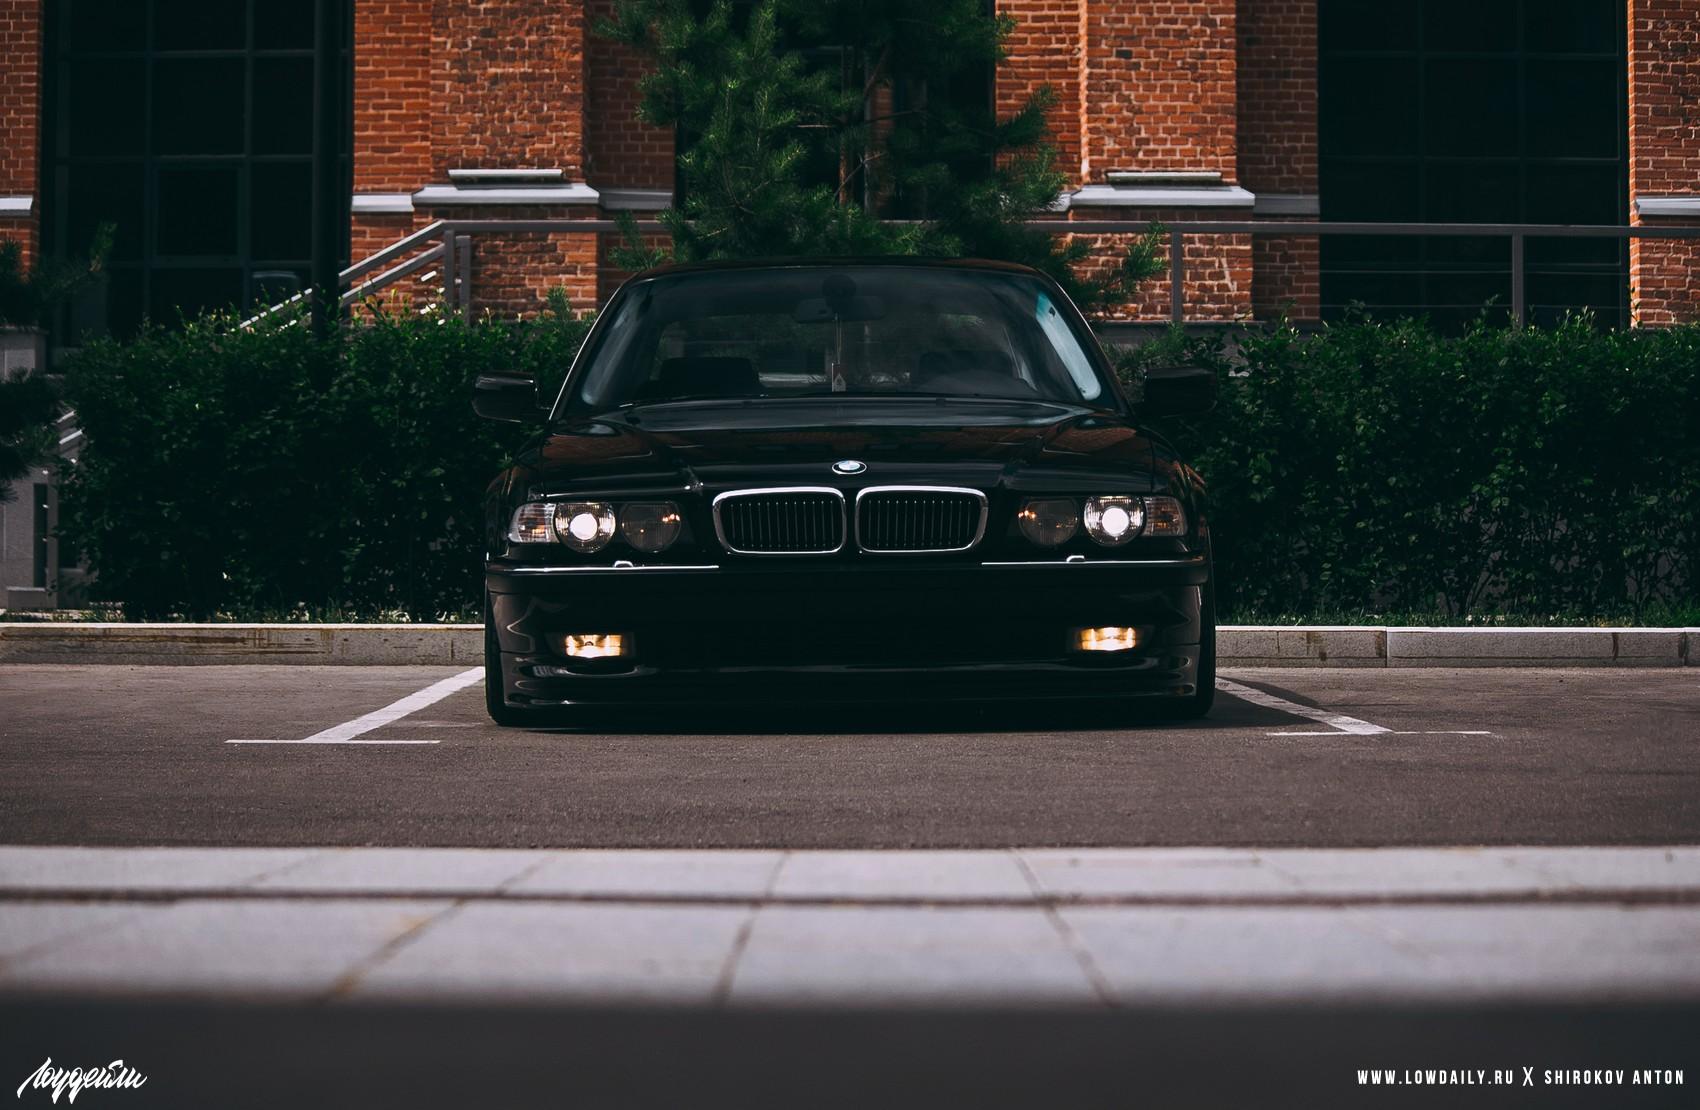 BMW E38 Lowdaily _MG_7020